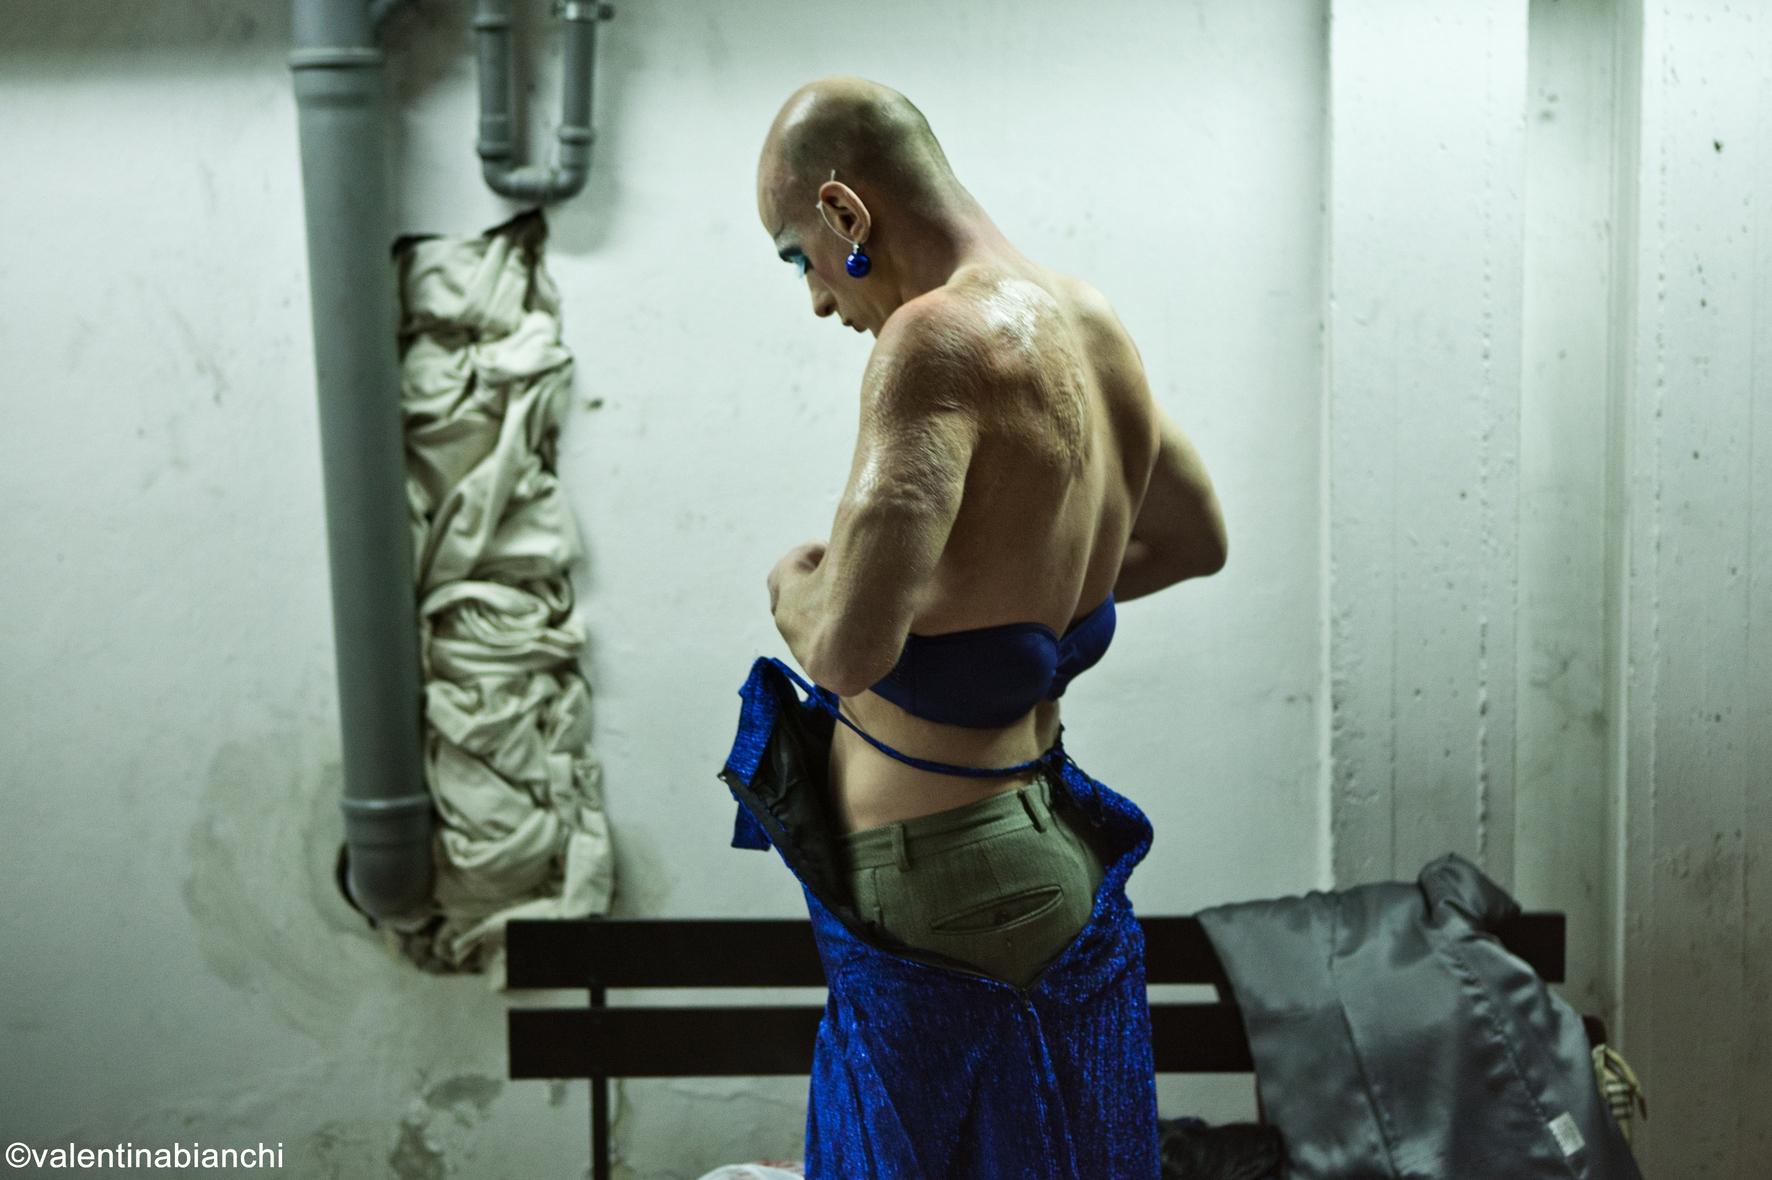 Backstage Ulisse Romano Ph Valentina Bianchi 2020 01 16 18 17 22 Utc 1